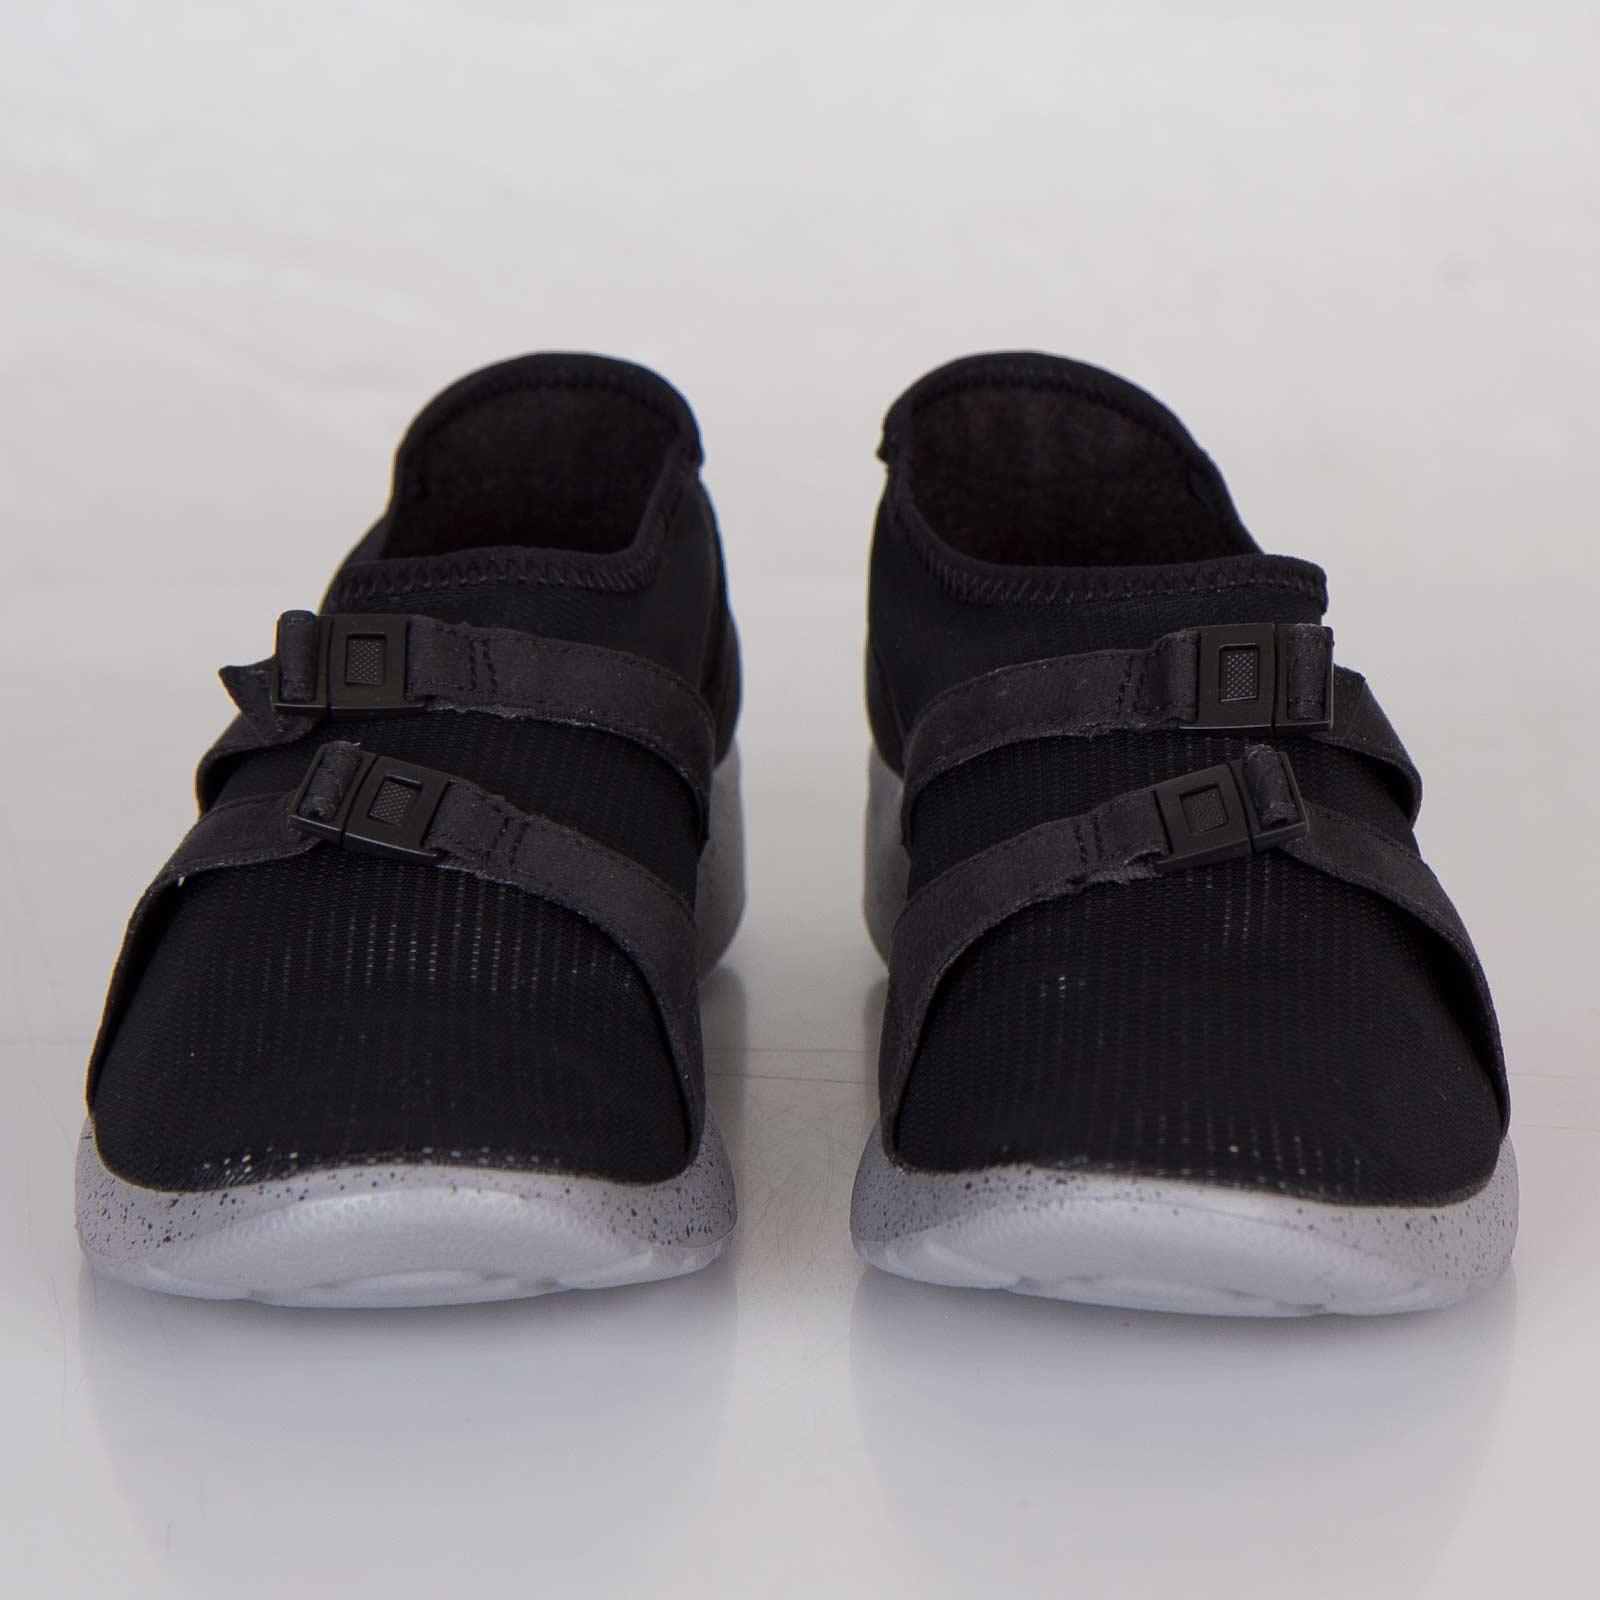 inalámbrico herramienta Fantasía  Nike Sock Racer SP - 677738-009 - Sneakersnstuff | sneakers & streetwear  online since 1999